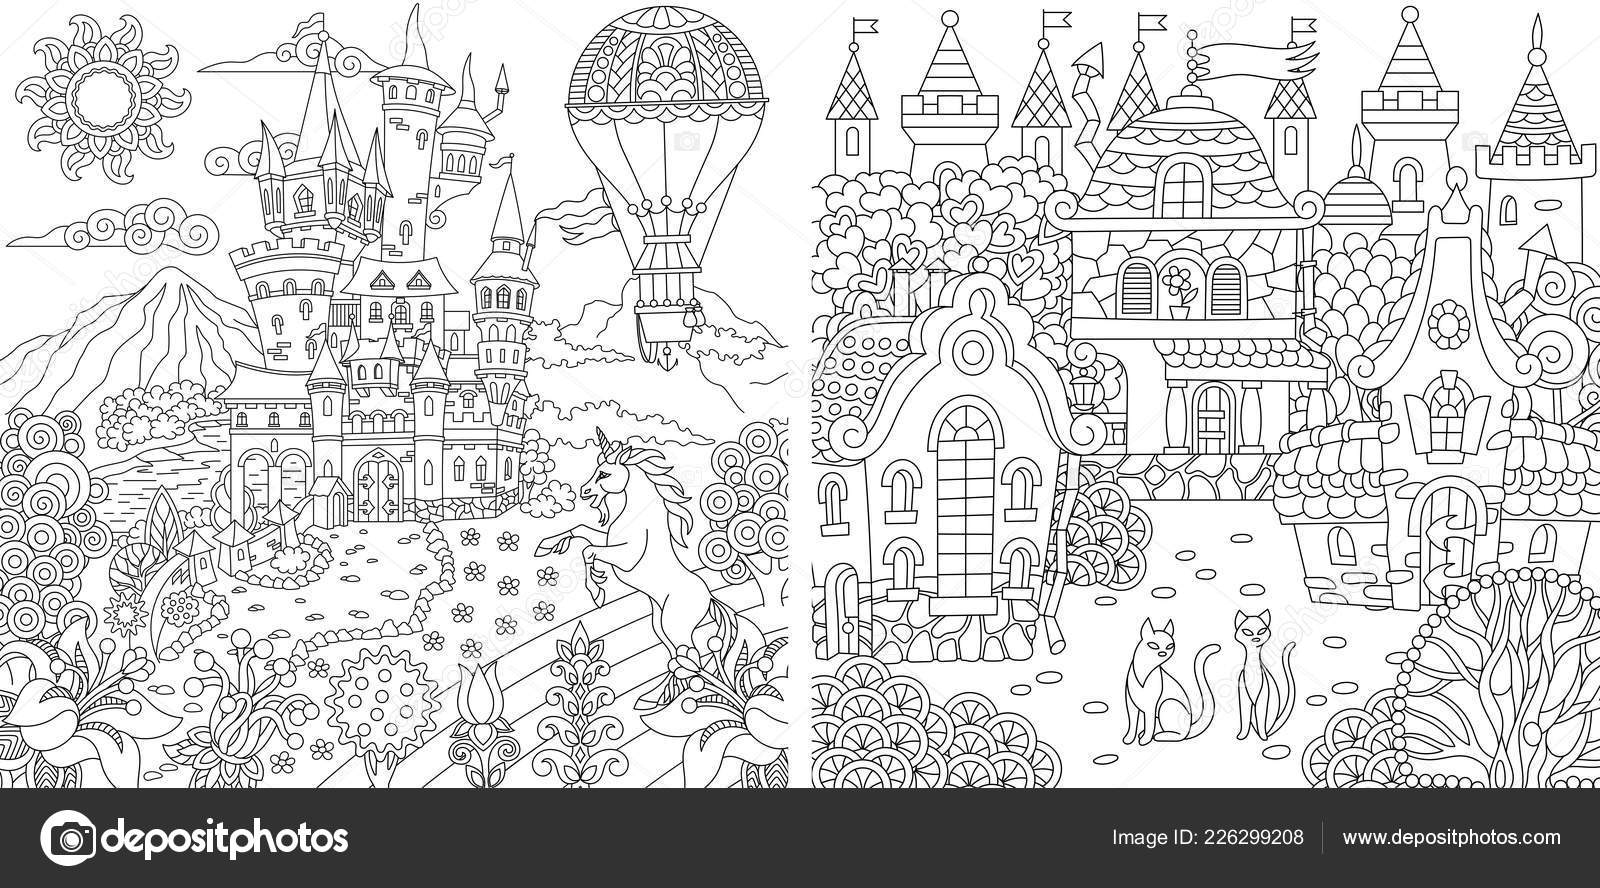 Kleurplaten Voor Volwassenen Fantasie.Kleurplaten Kleurboek Voor Volwassenen Kleuren Van Foto Met Fantasie